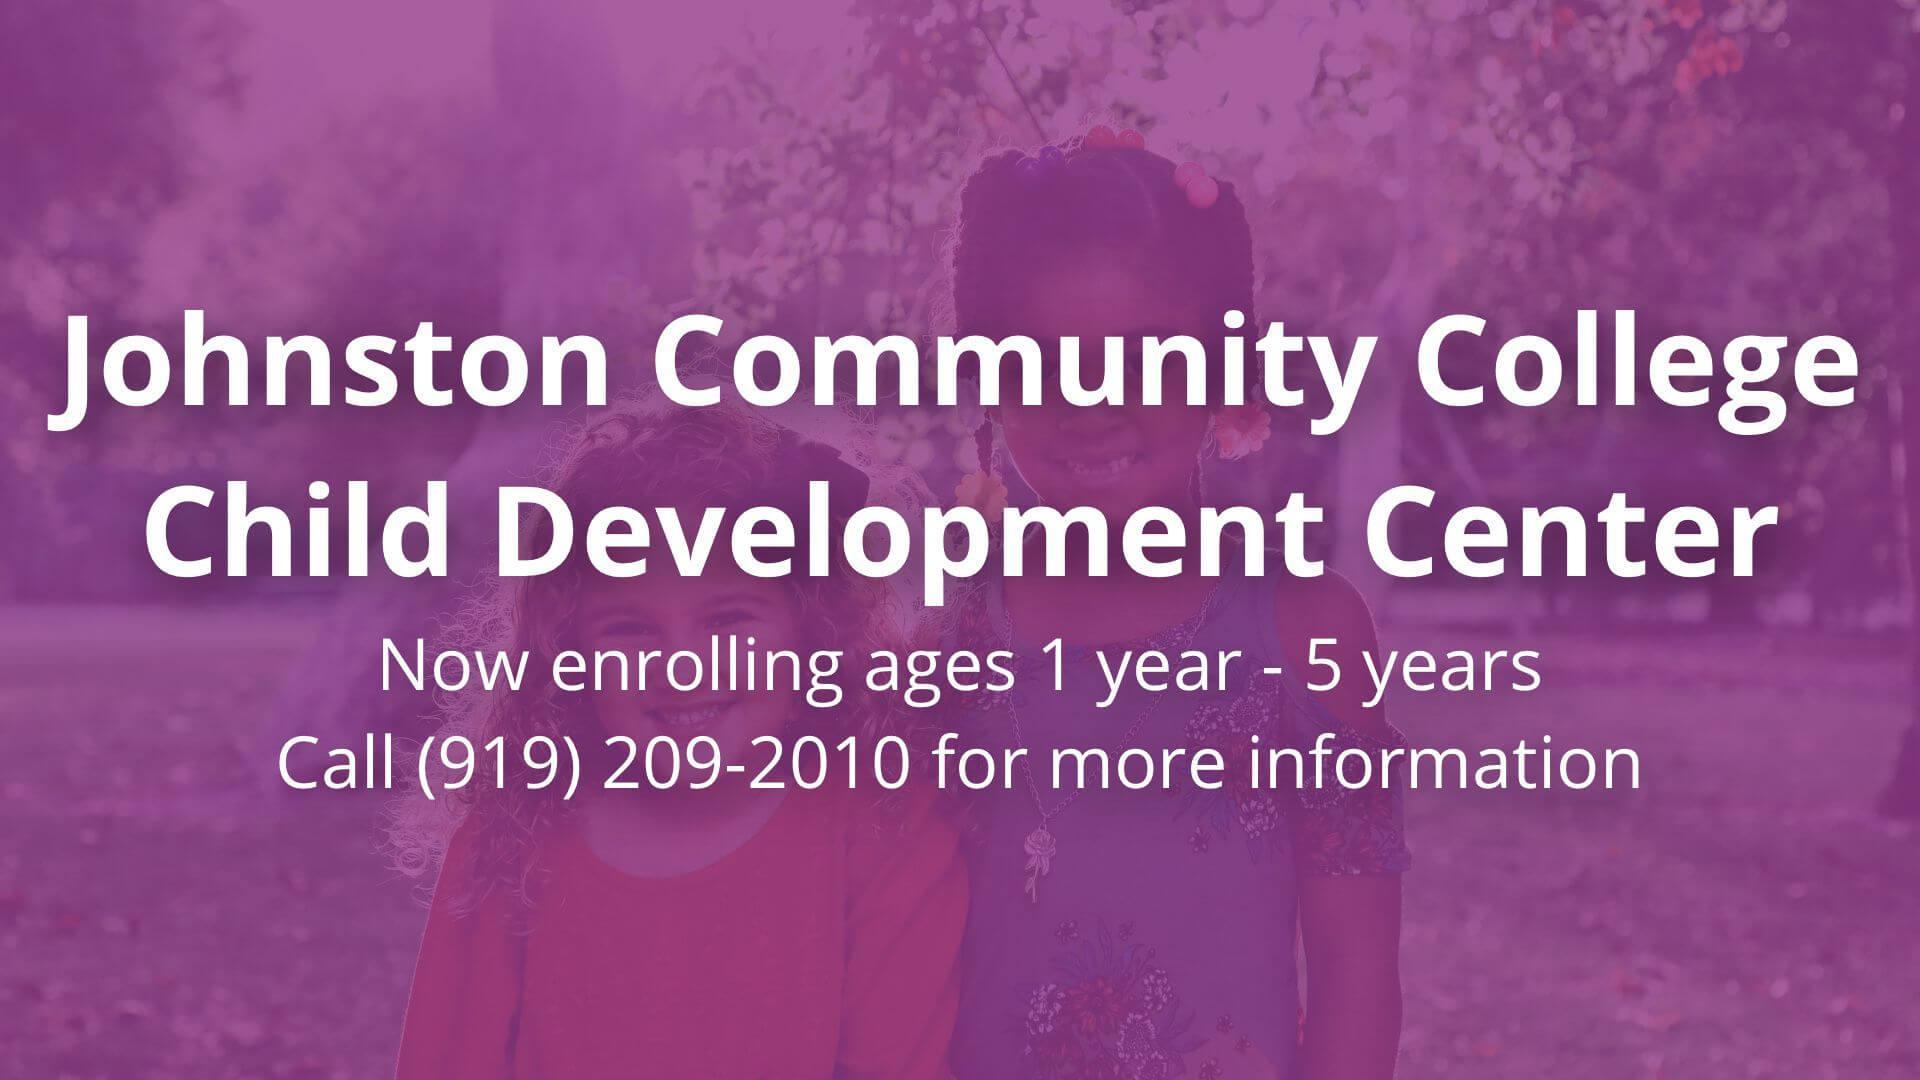 JCC Child Development Center